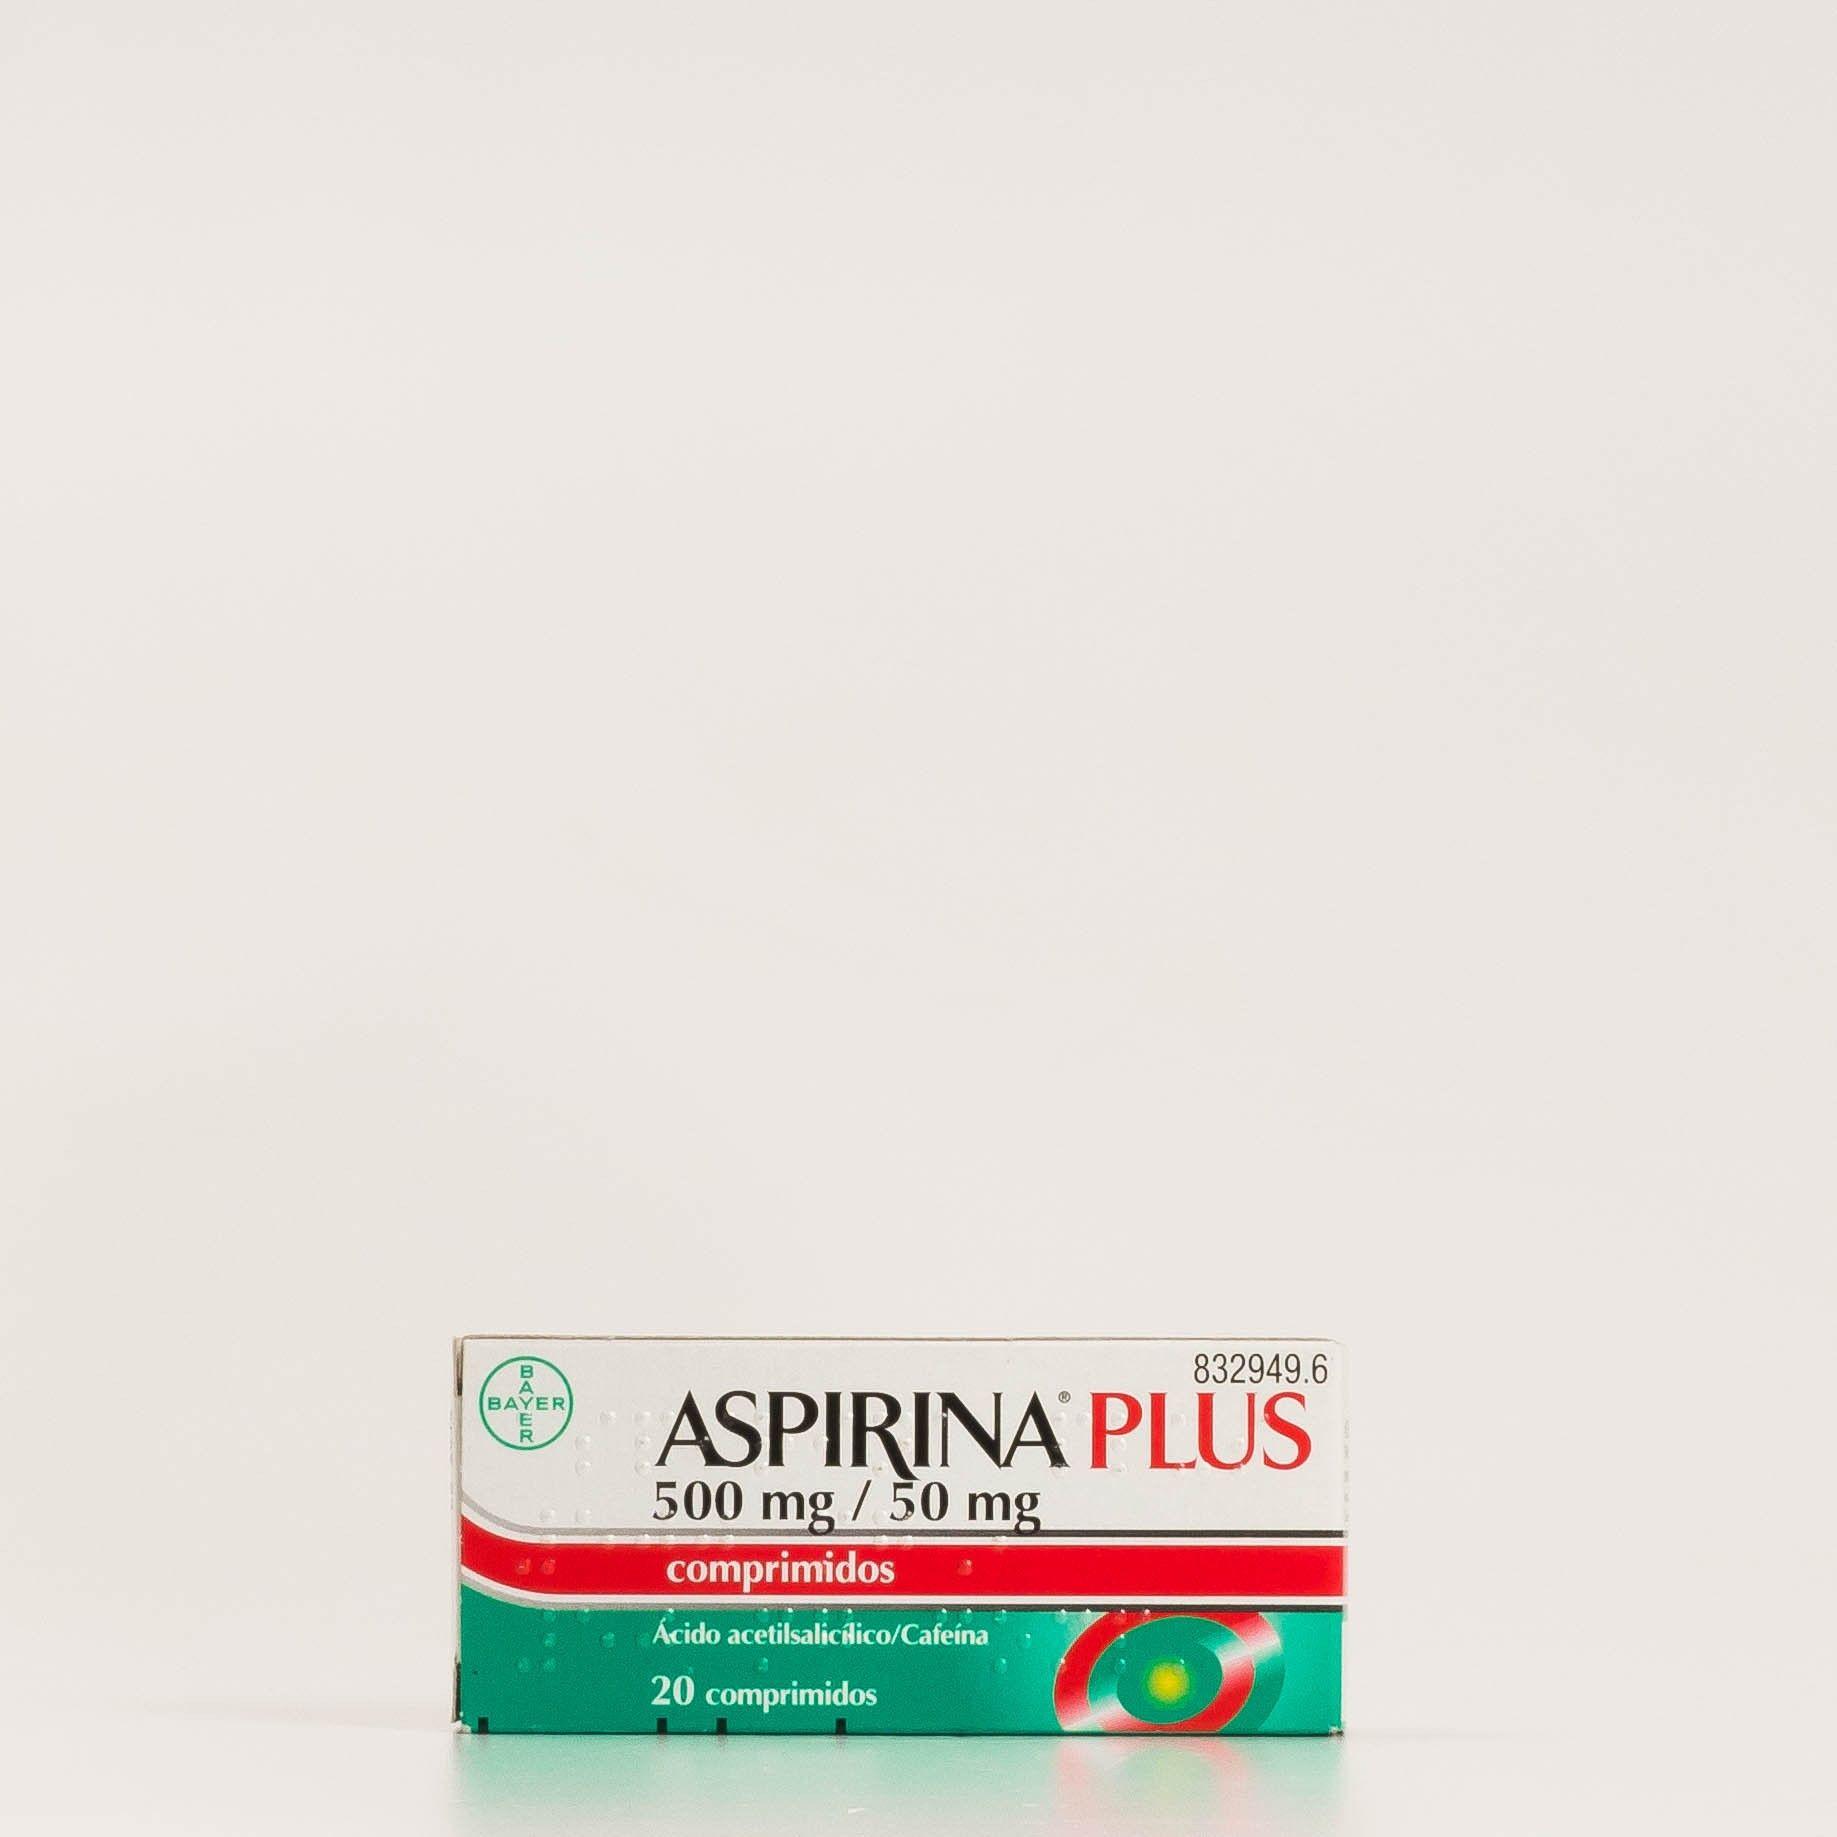 Aspirina PLUS